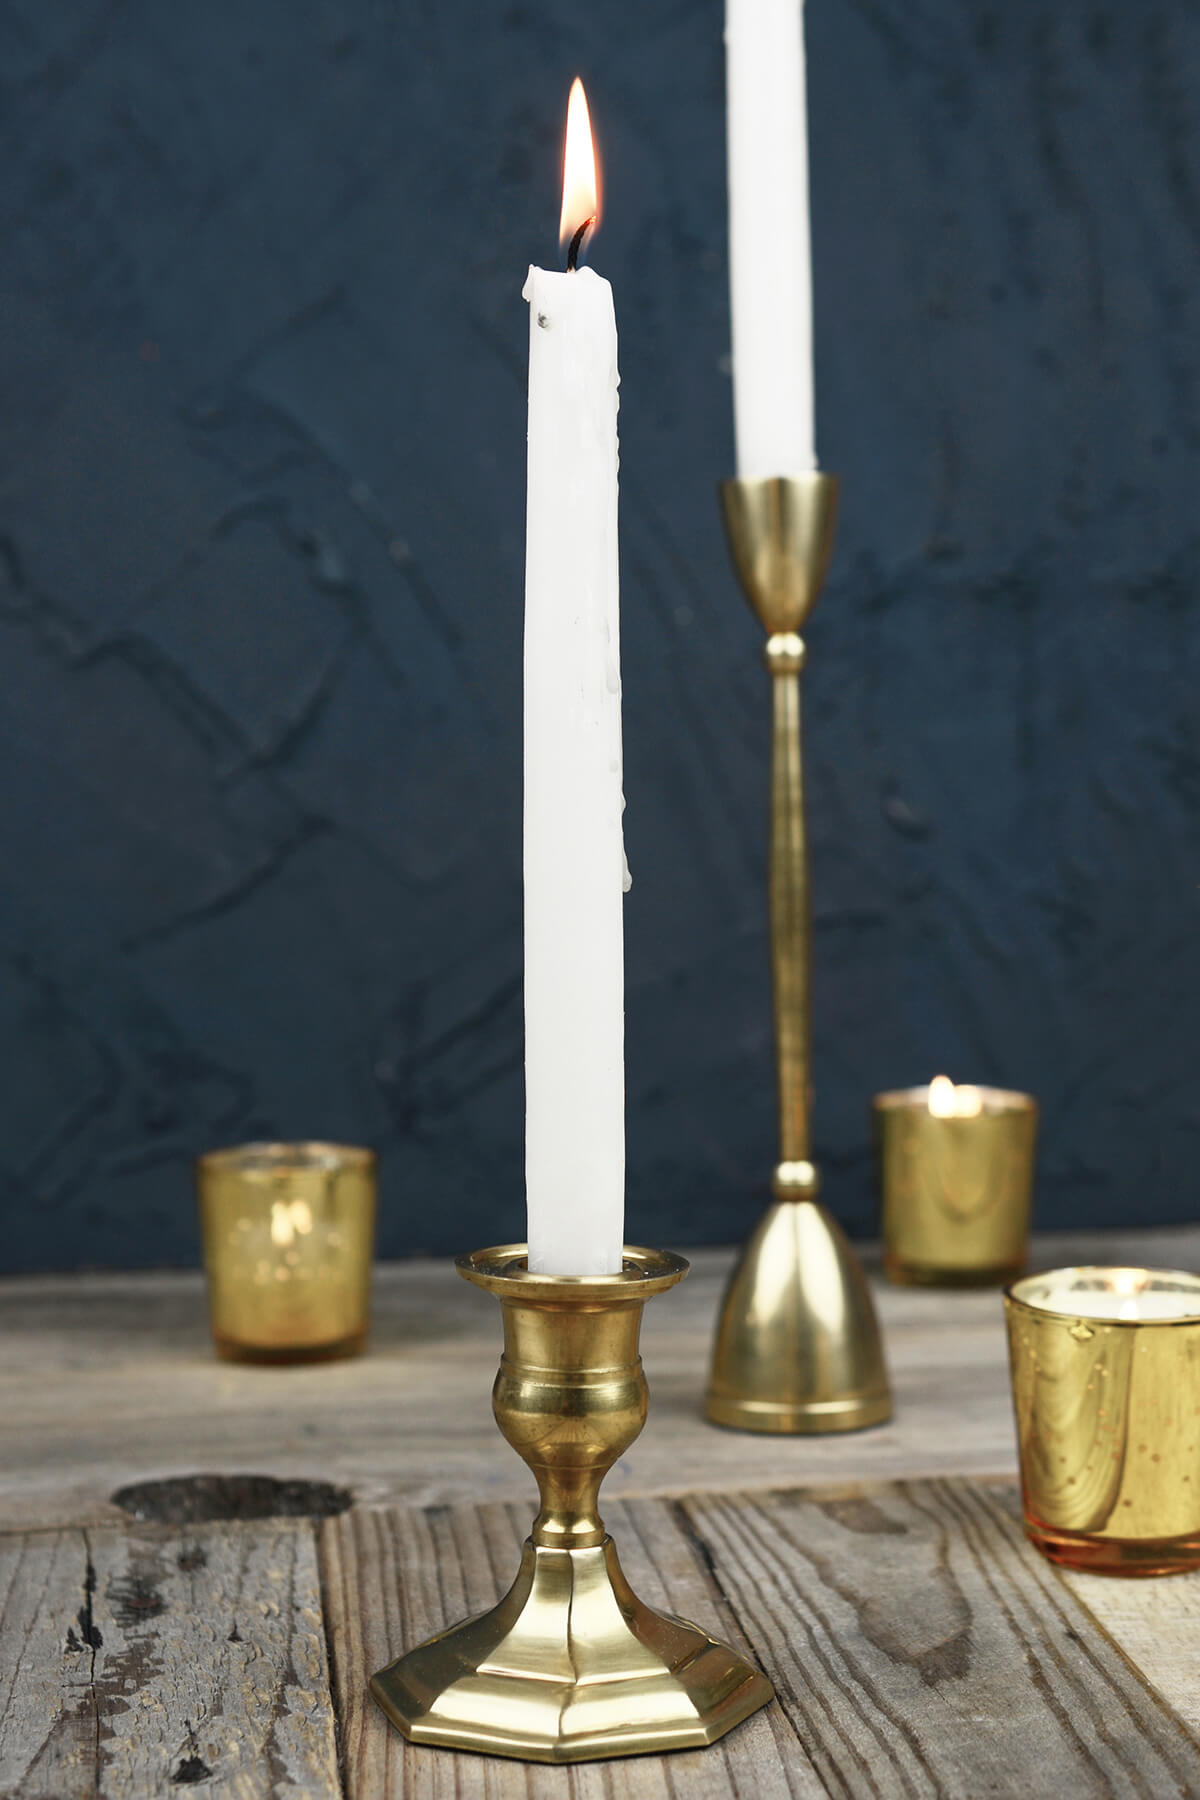 Gold Metal 3 Taper Candle Holder Antique Candlestick